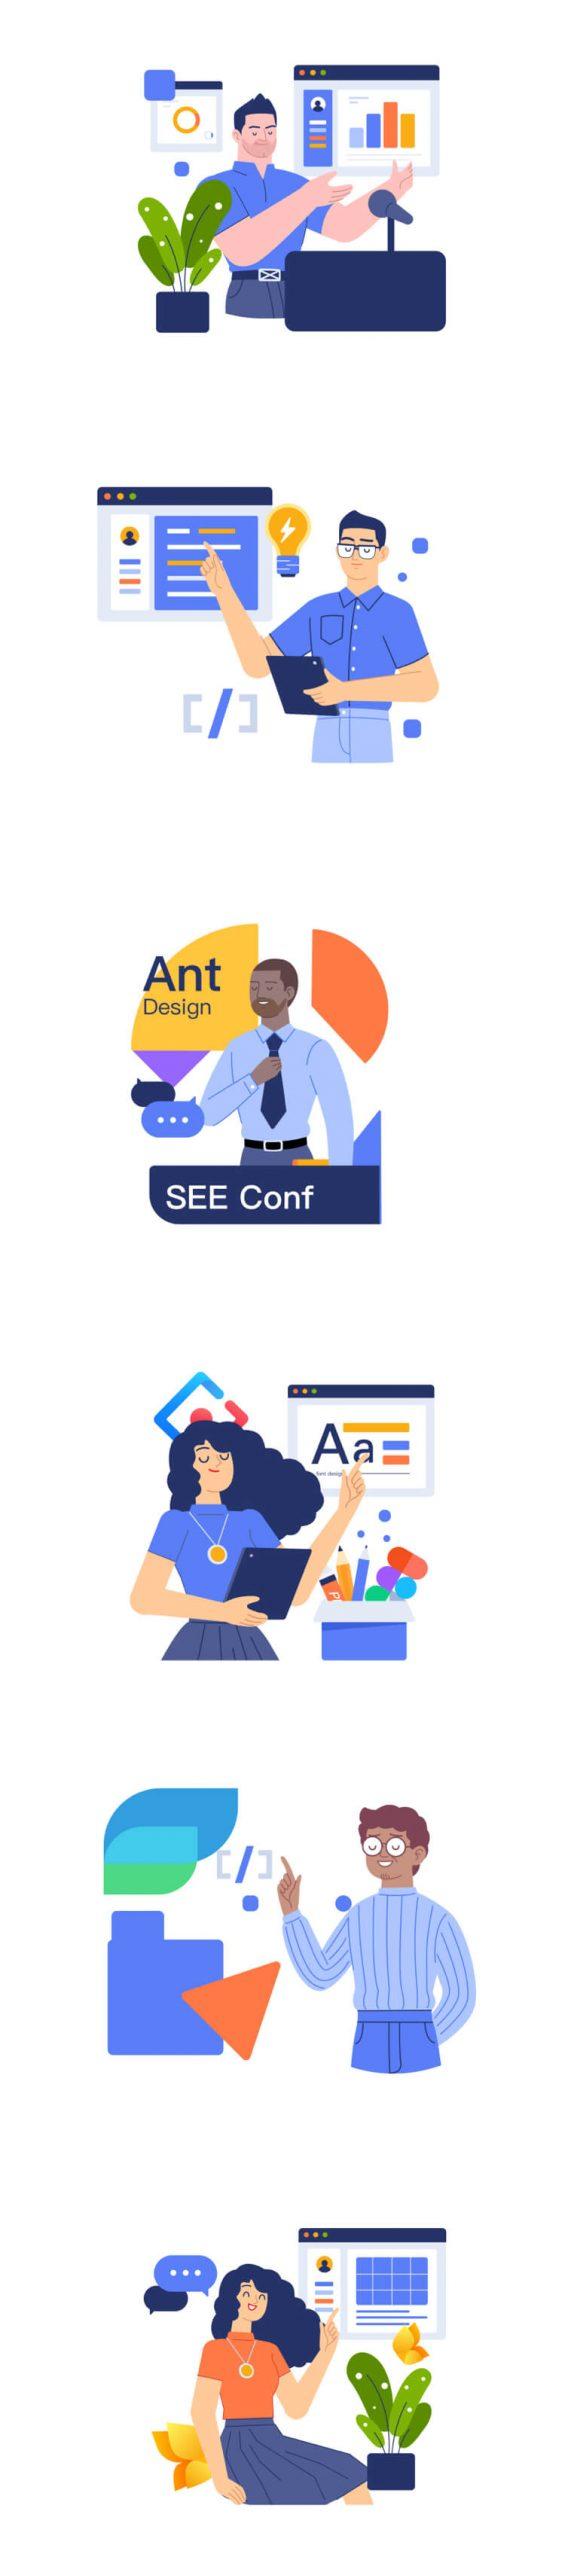 Hitu Illustration Components Free - UI Freebies